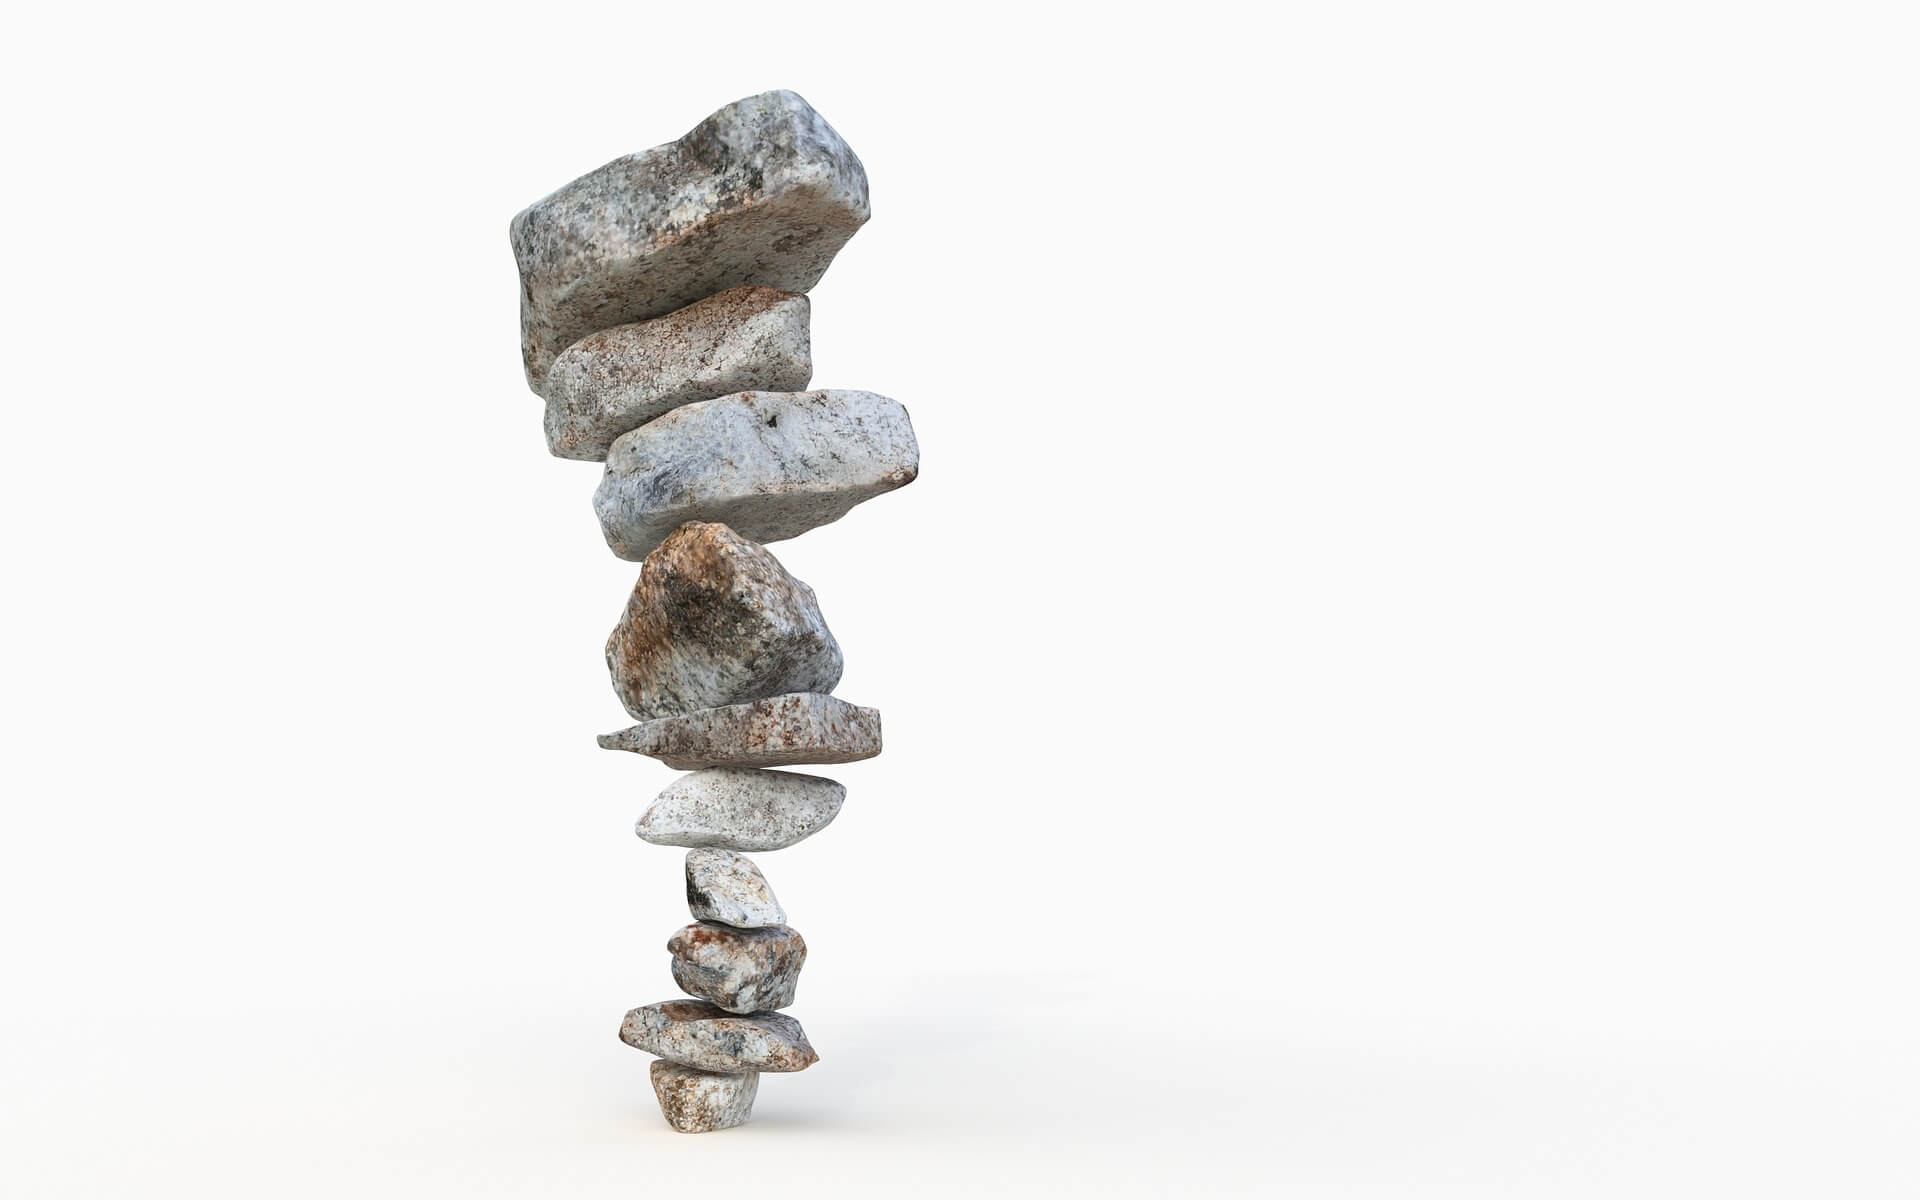 How To Buy Bitcoin With Amazon Balance